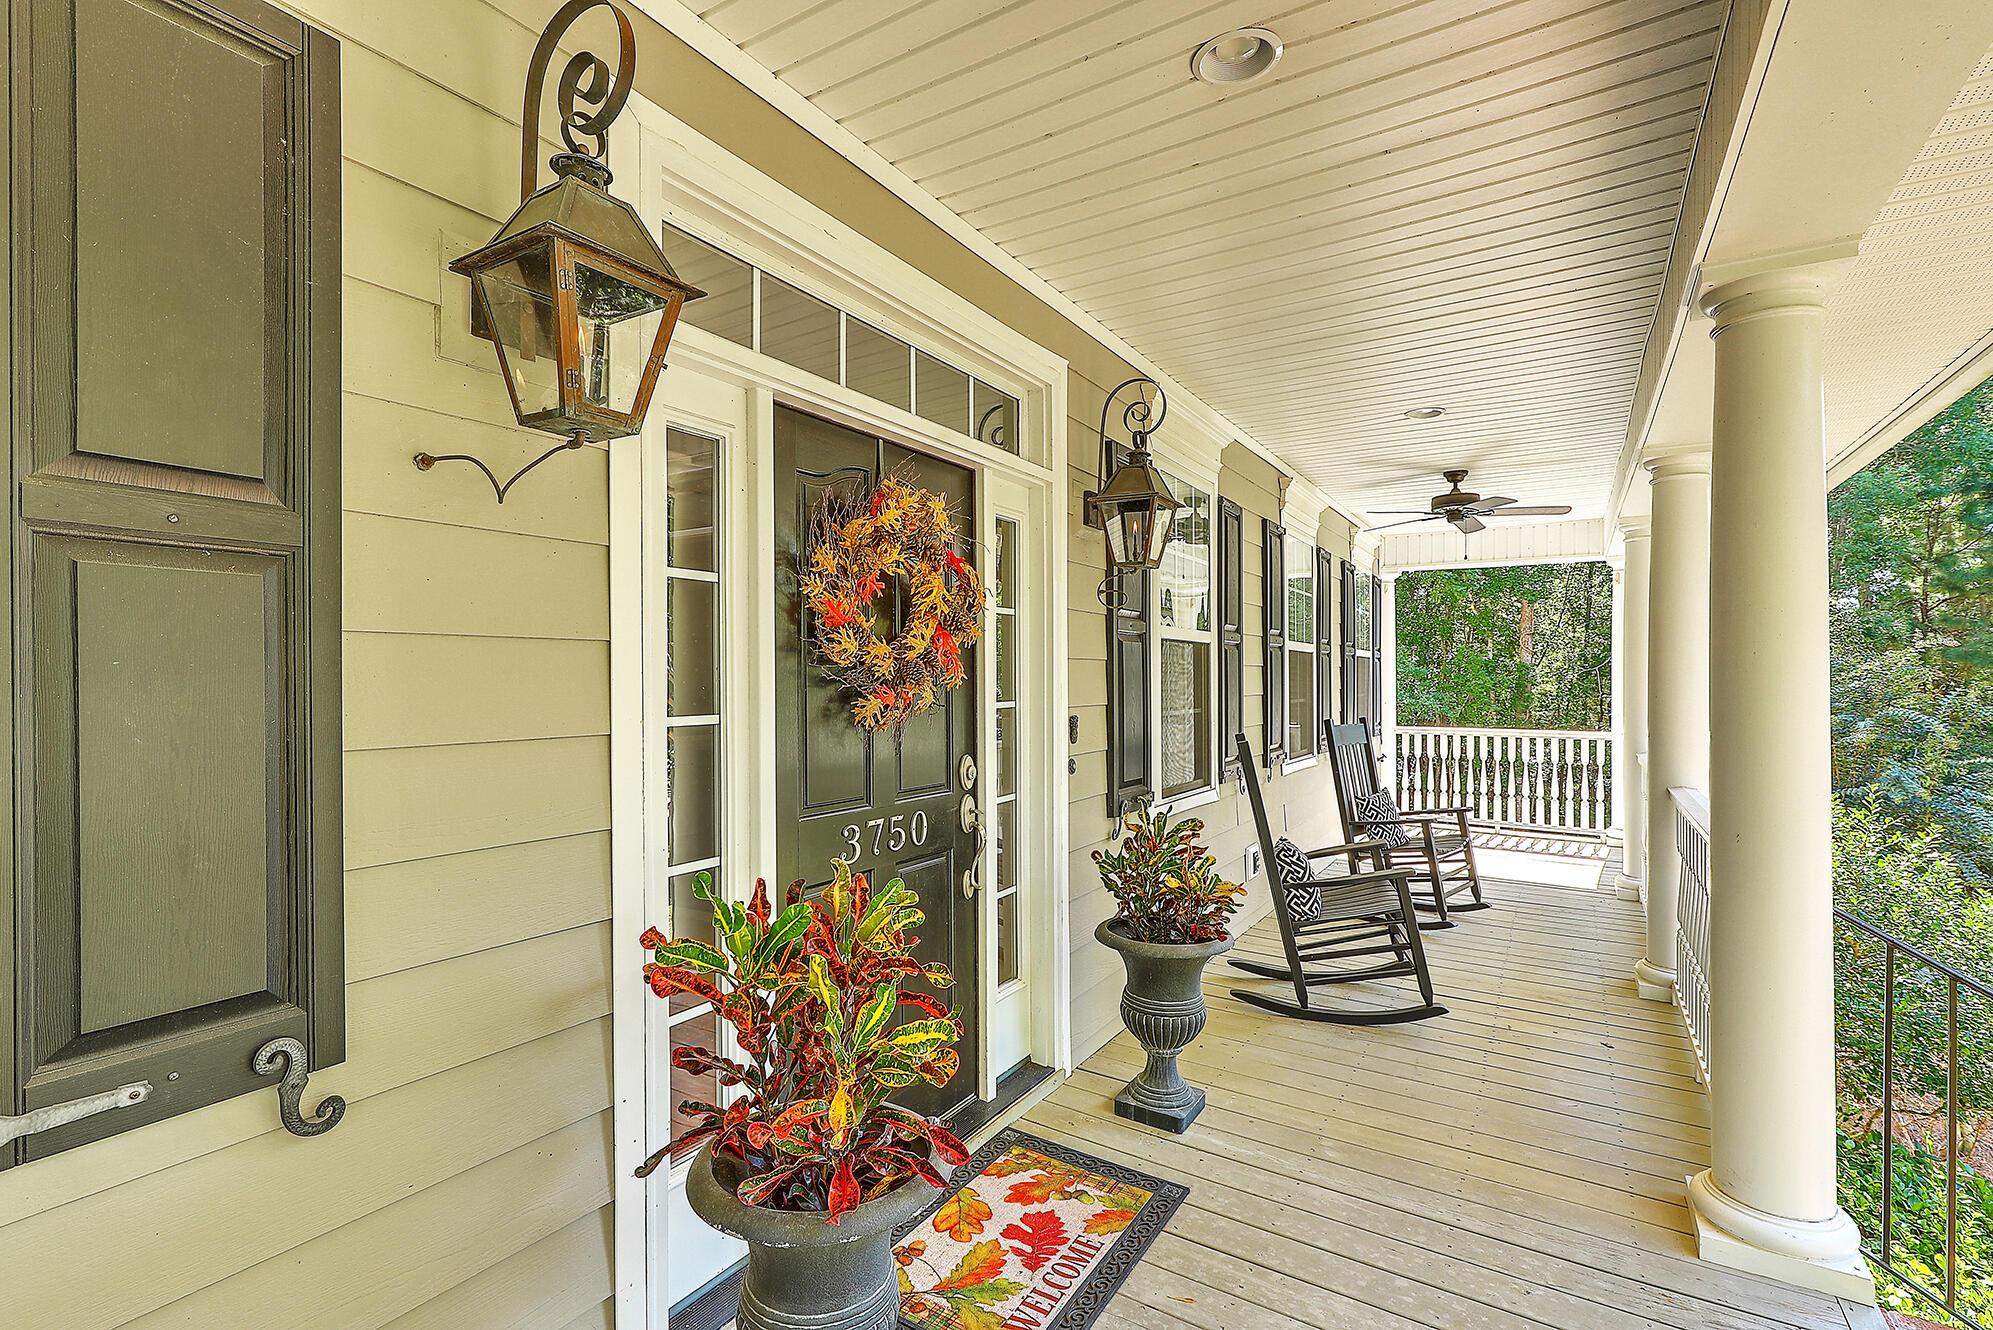 Darrell Creek Homes For Sale - 3750 Saint Ellens, Mount Pleasant, SC - 34